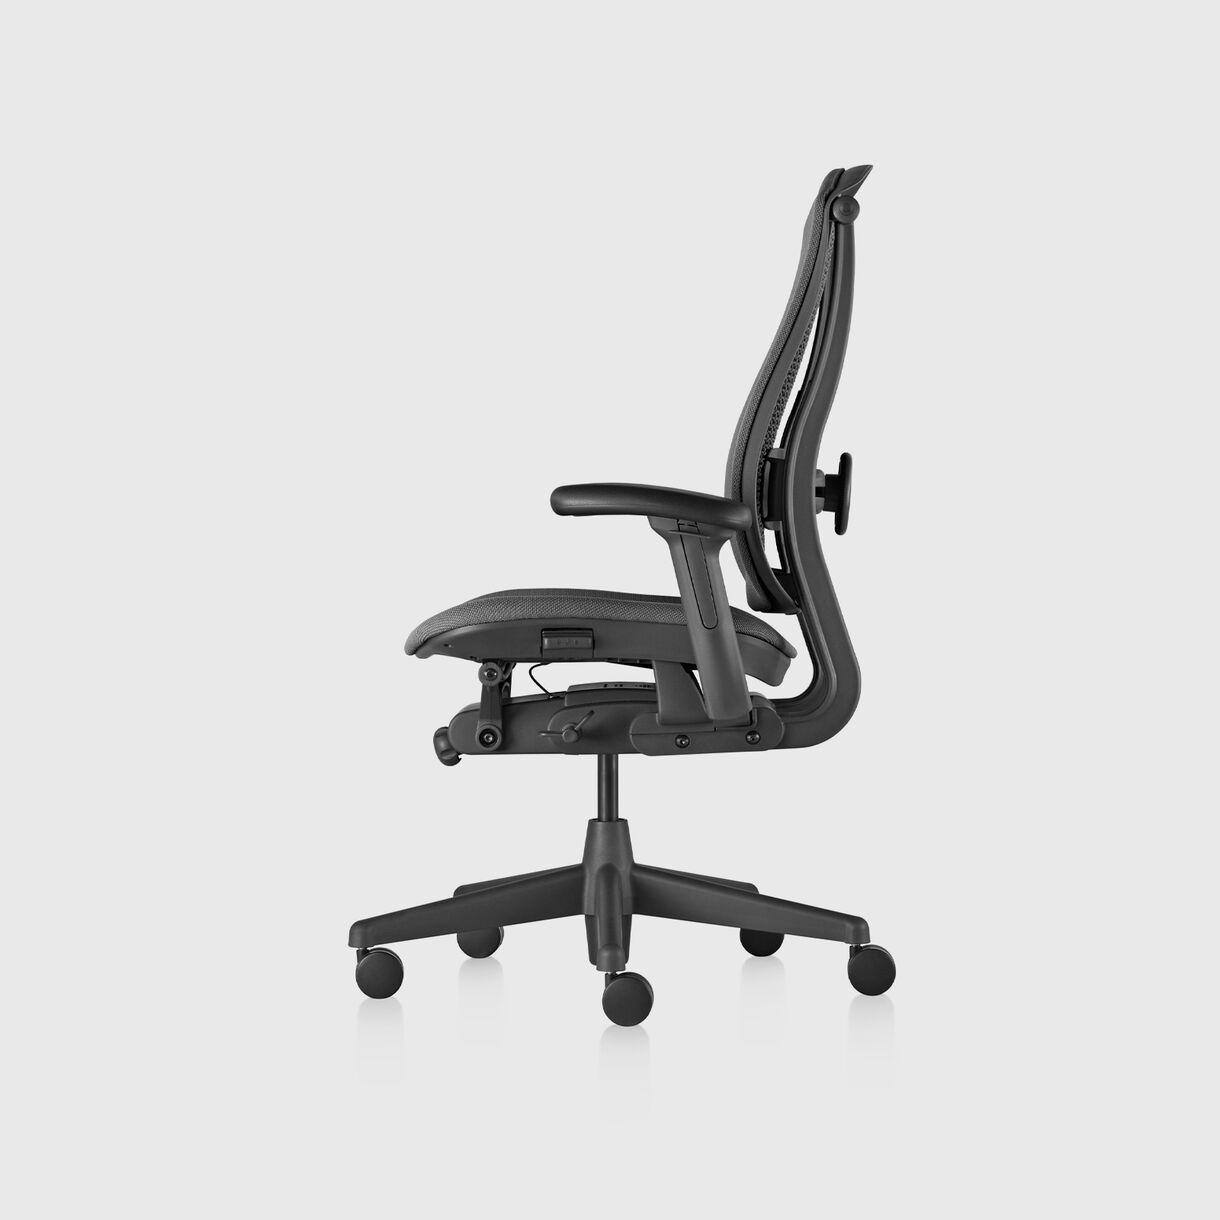 Celle Chair